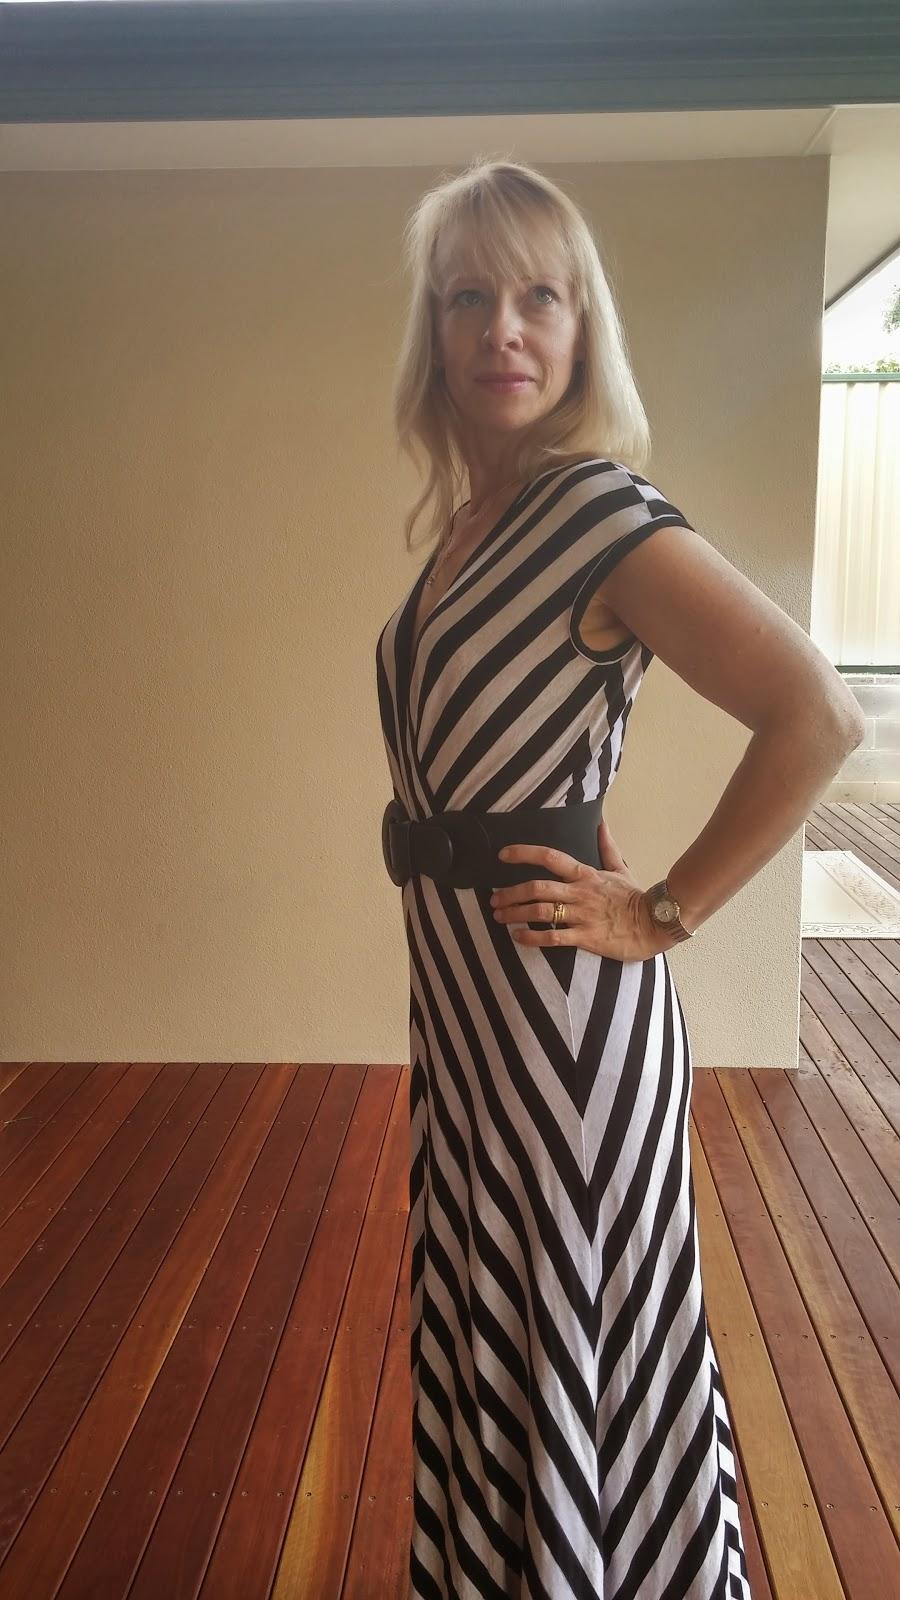 Vogue 1027 with quarter circle maxi skirt